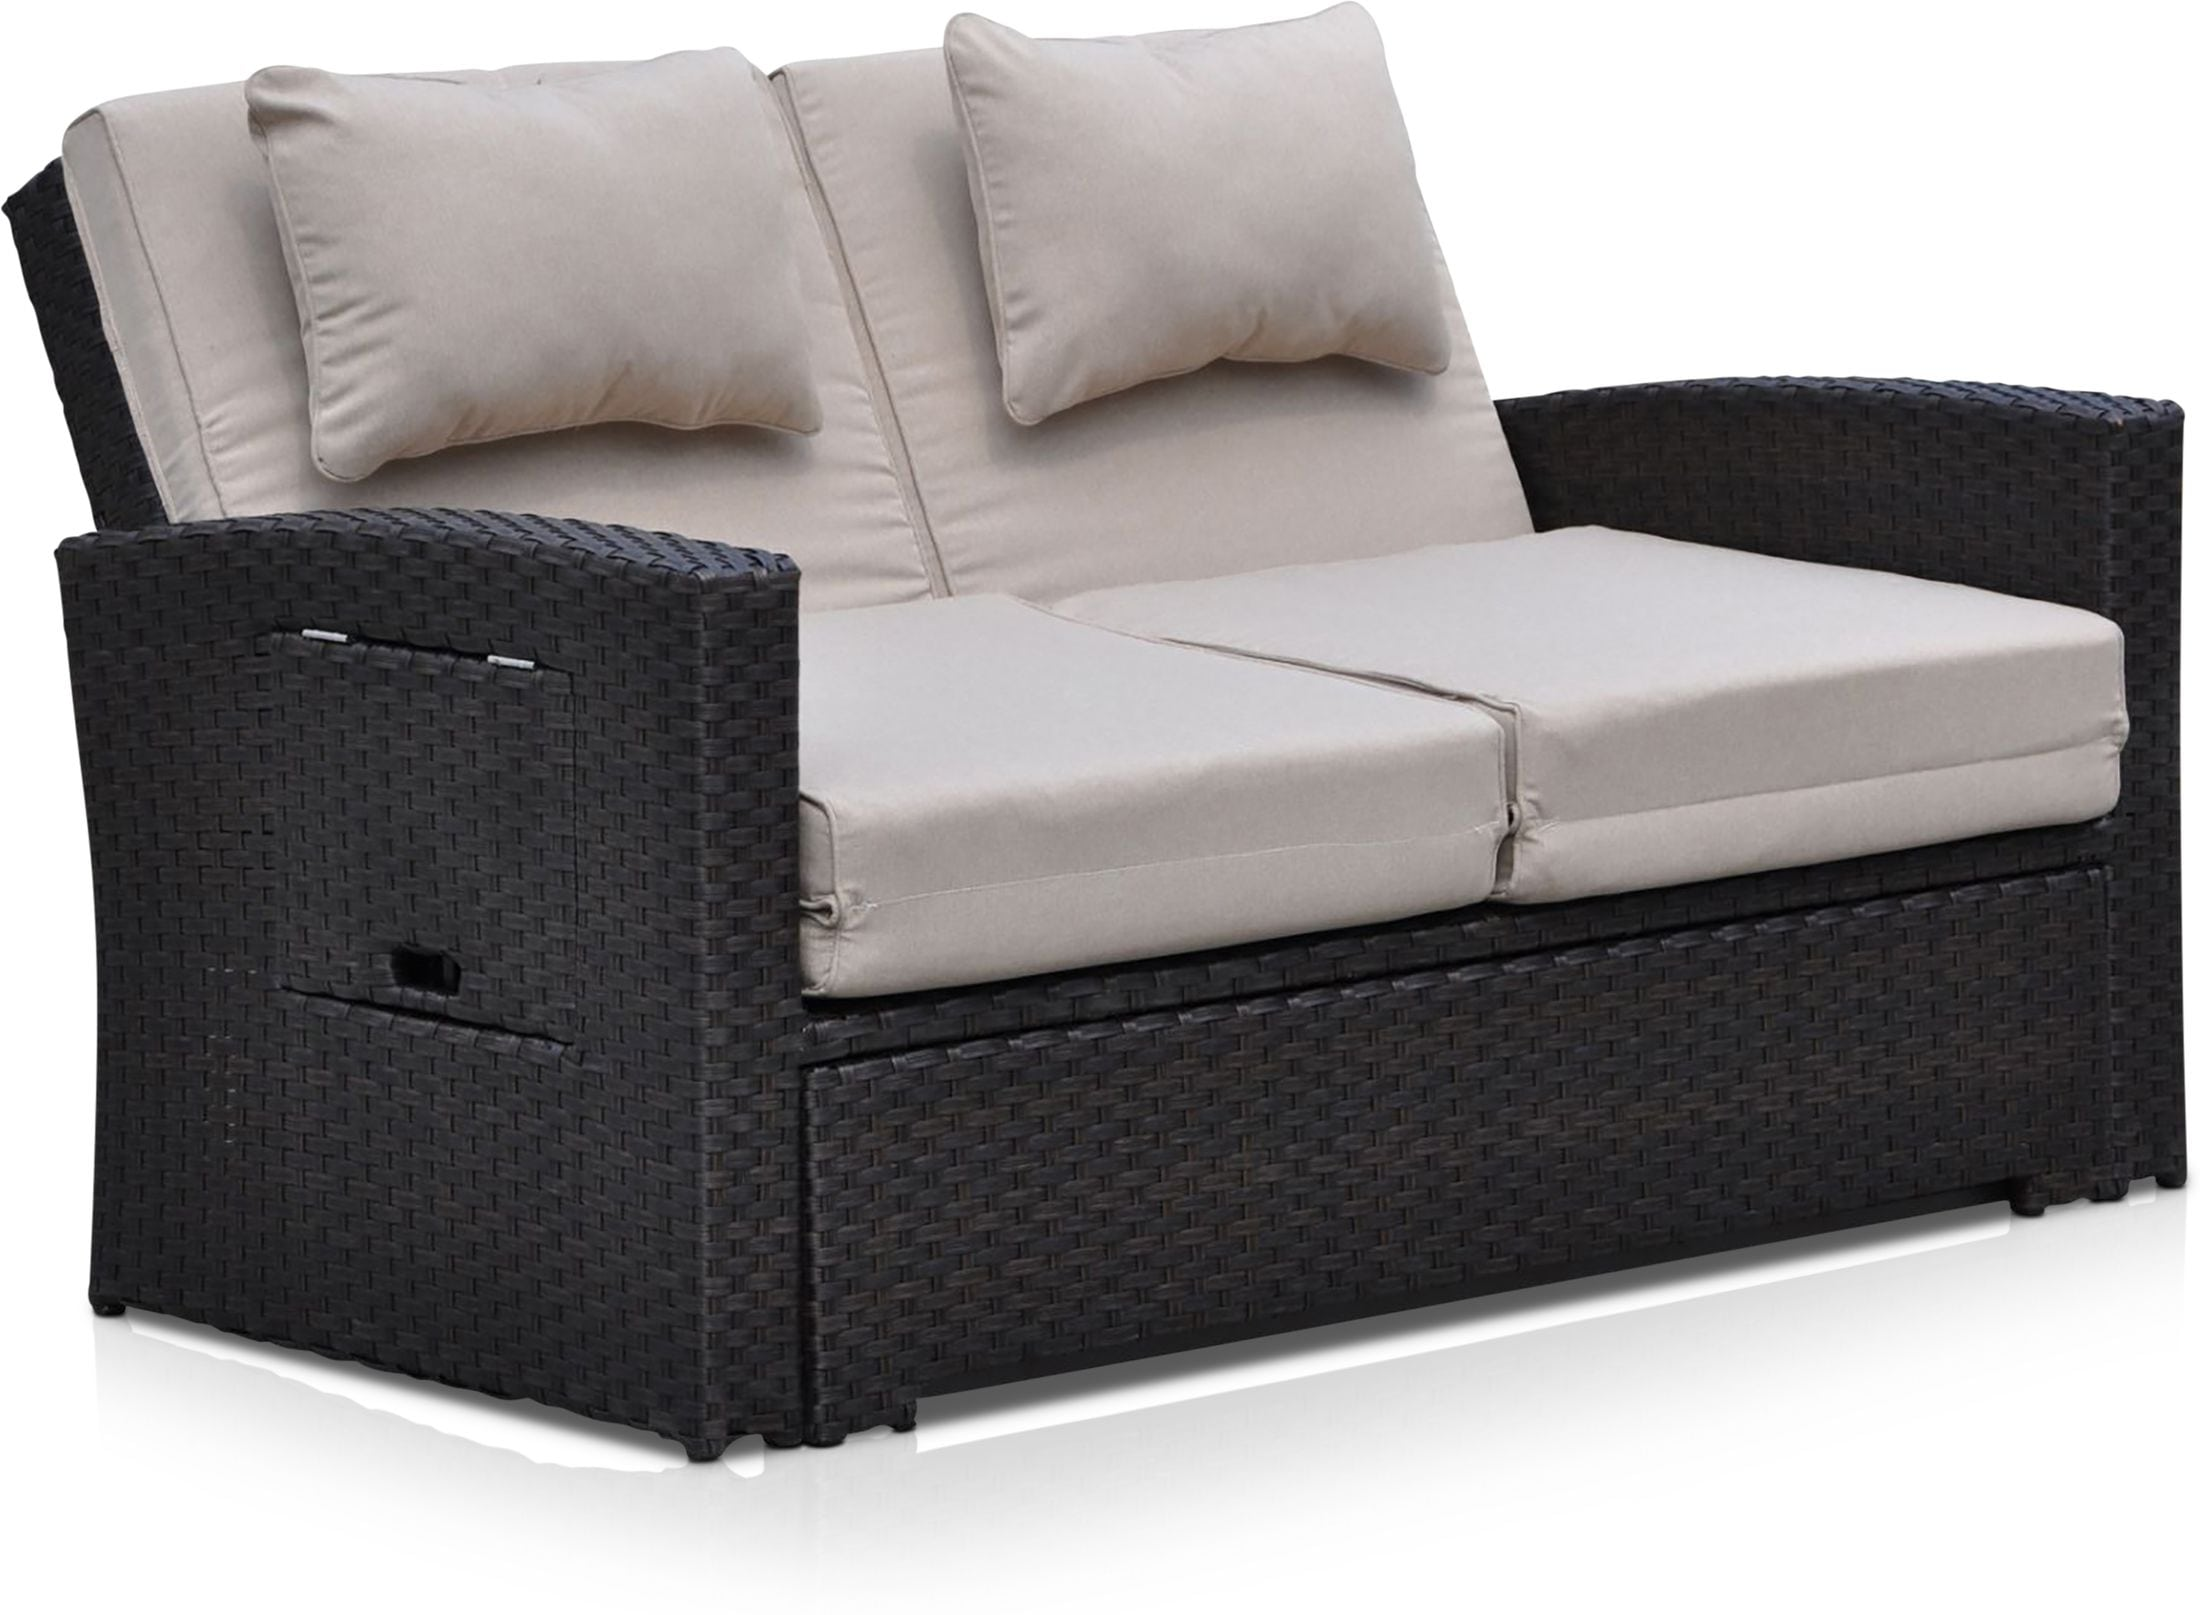 Outdoor Furniture - Northport Outdoor Convertible Loveseat